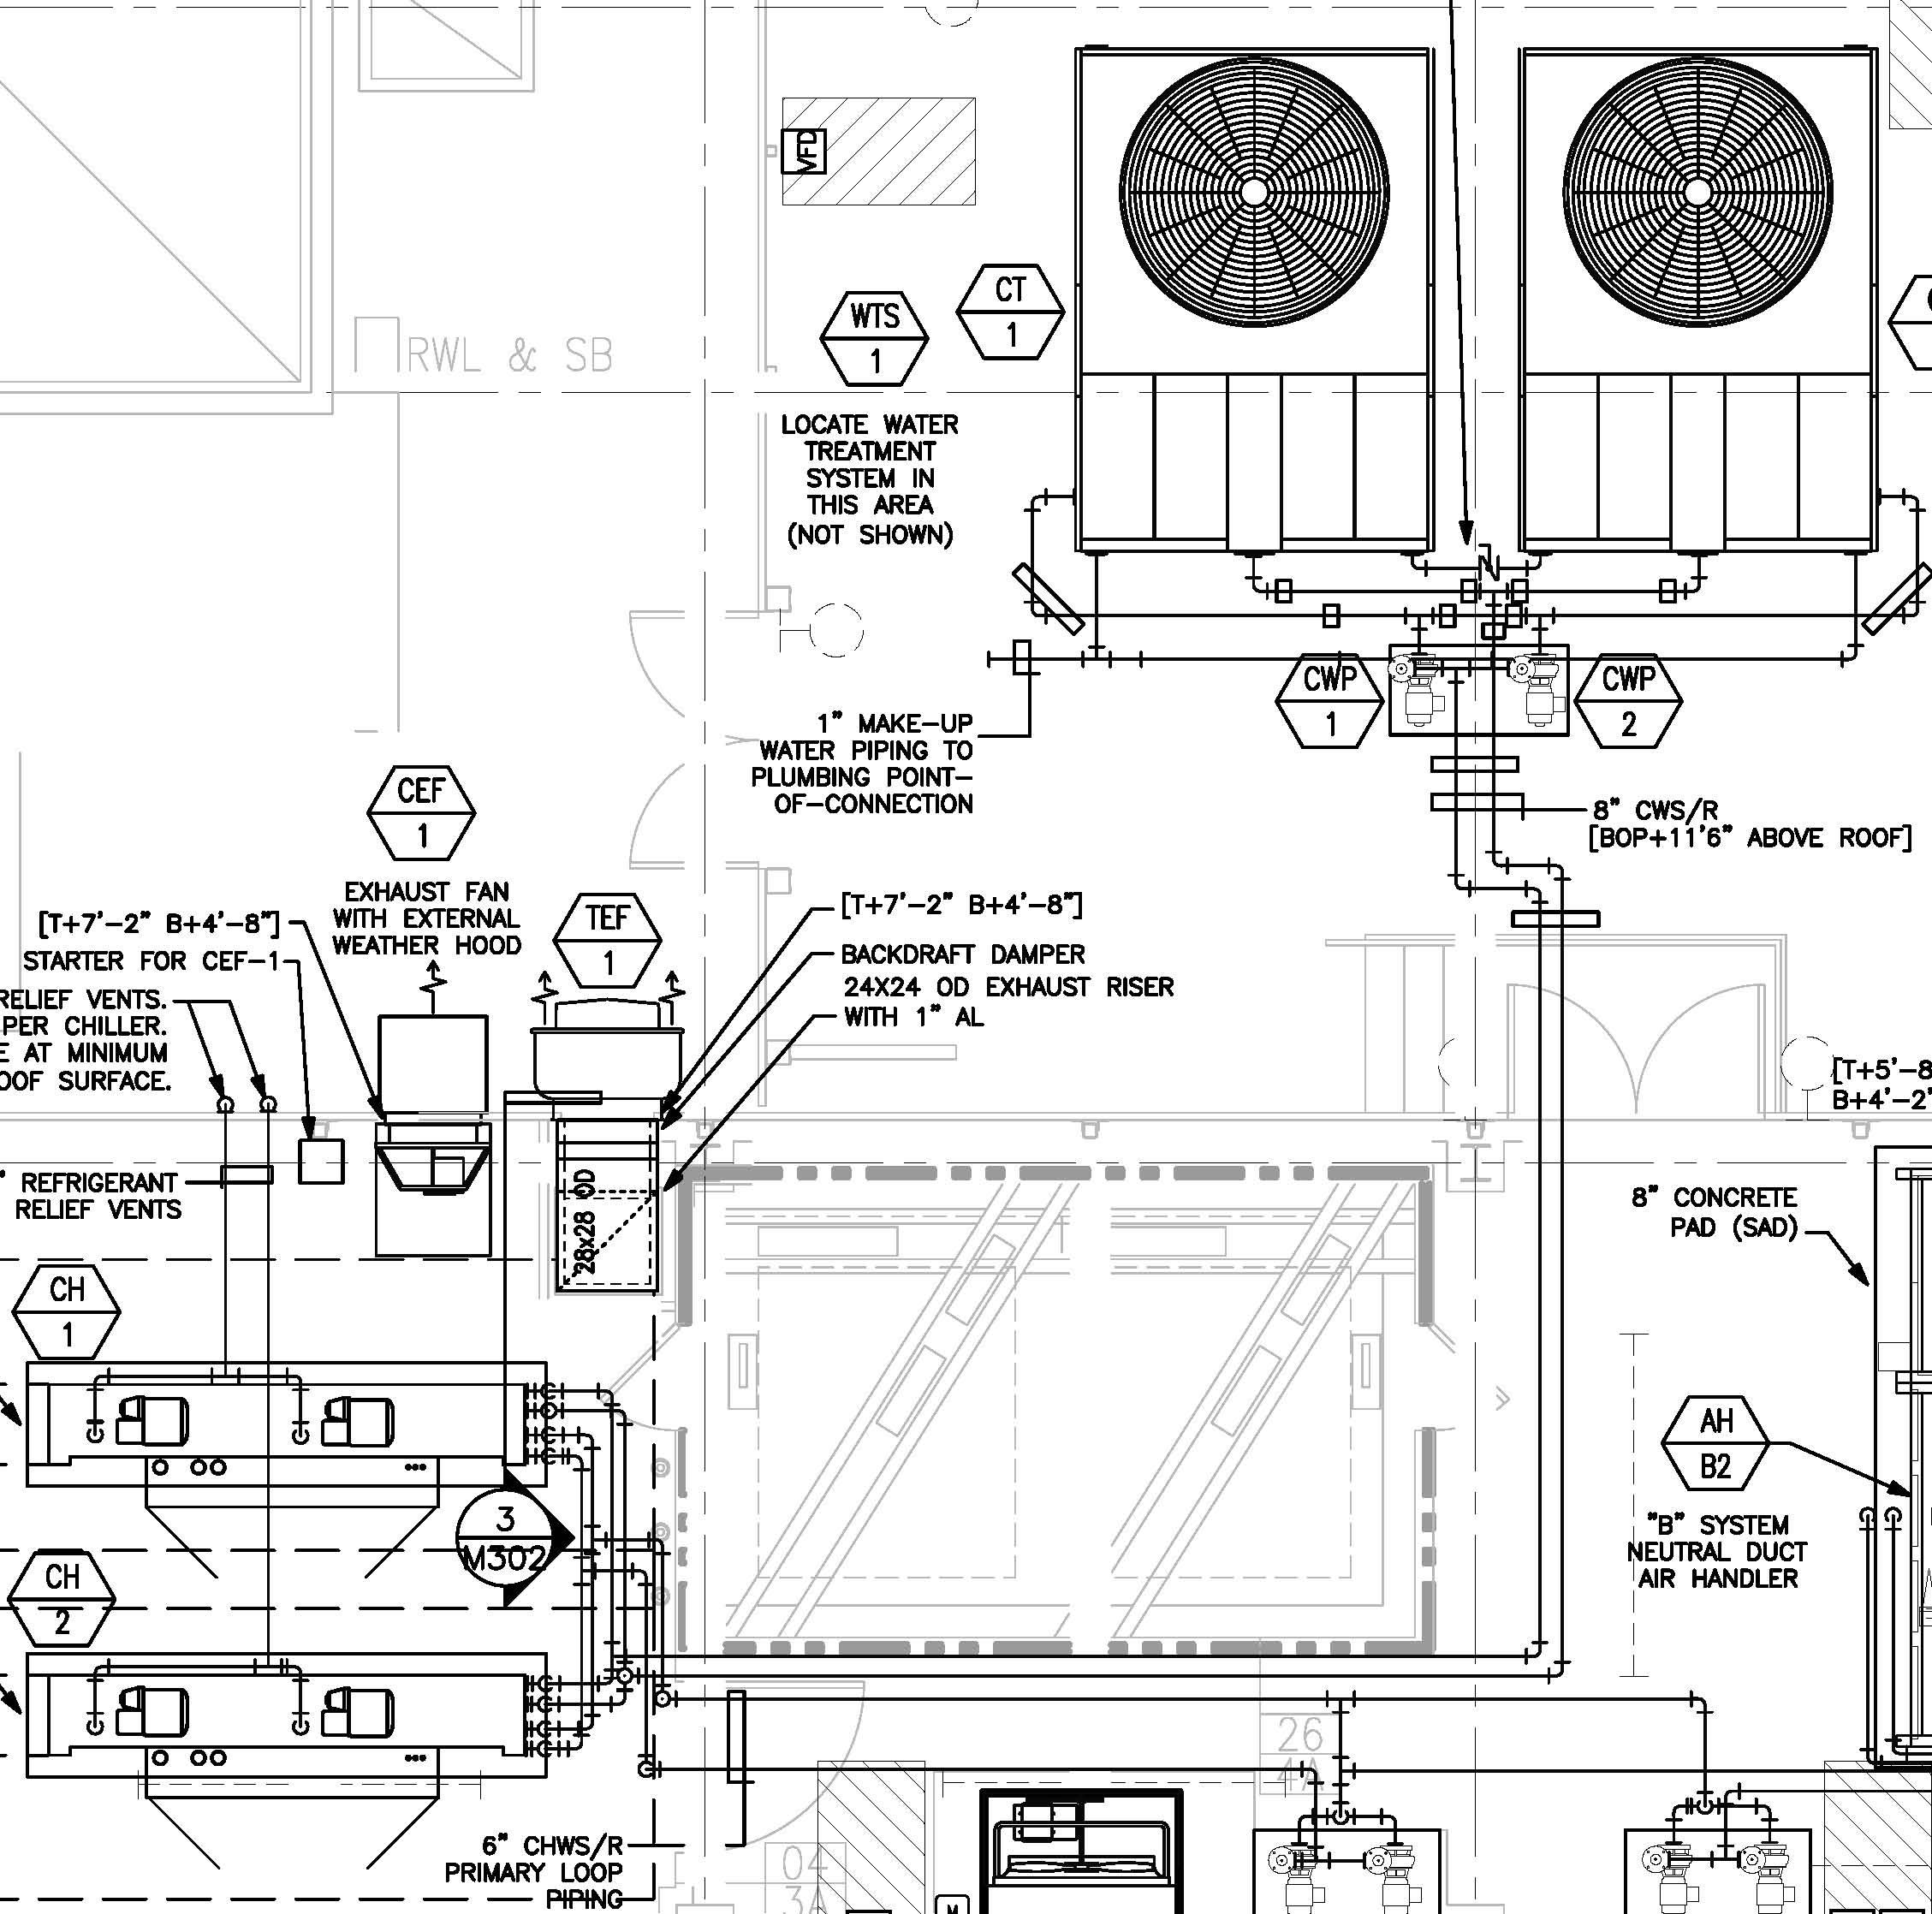 Bohn Unit Coolers Wiring Diagrams - Wiring Diagrams Schematics